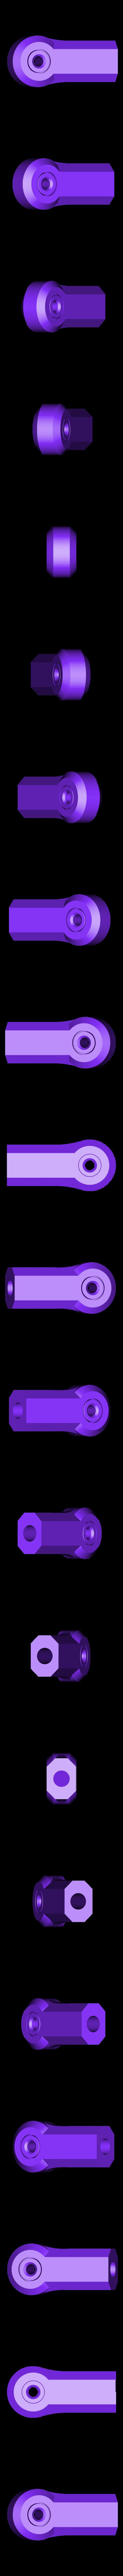 TIE_ROD_ENDS.stl Download free STL file Tie Rod Ends • 3D printer model, MuSSy